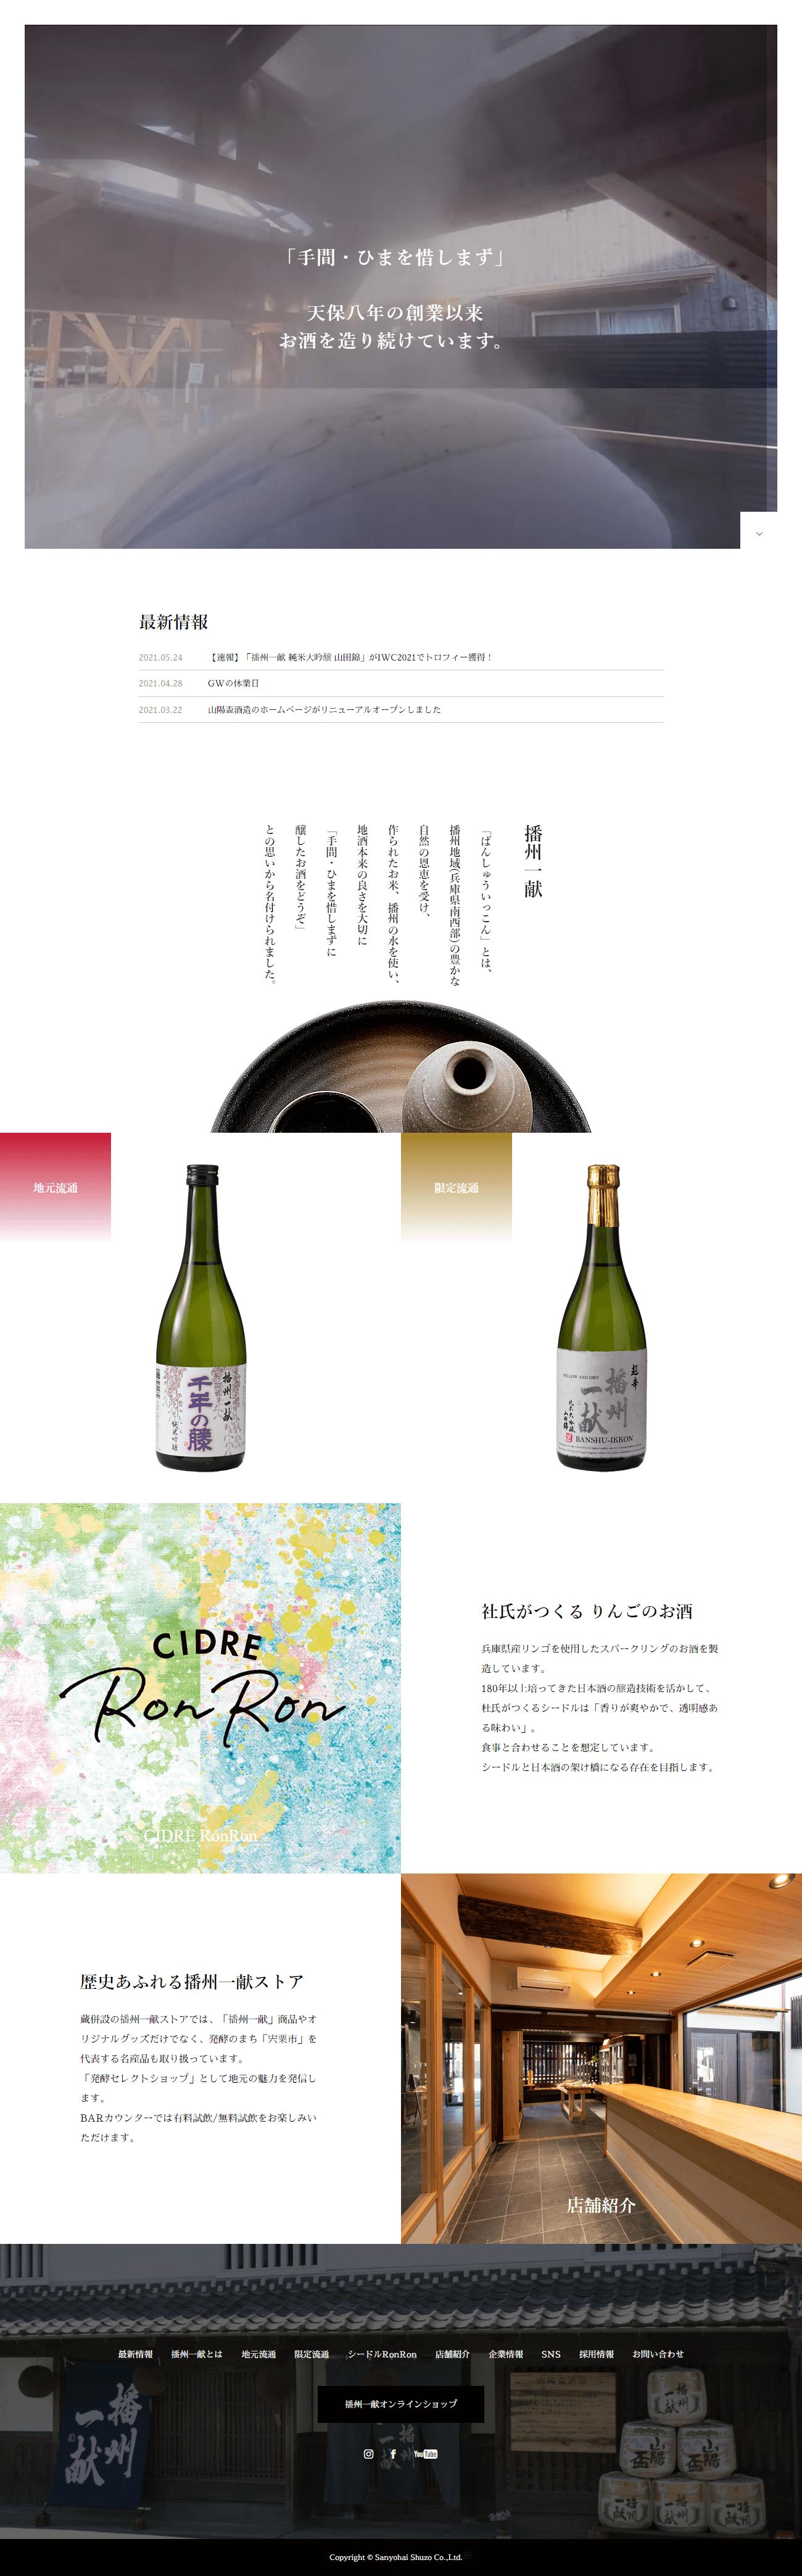 宍粟市 山陽盃酒造株式会社 ホームページ制作1